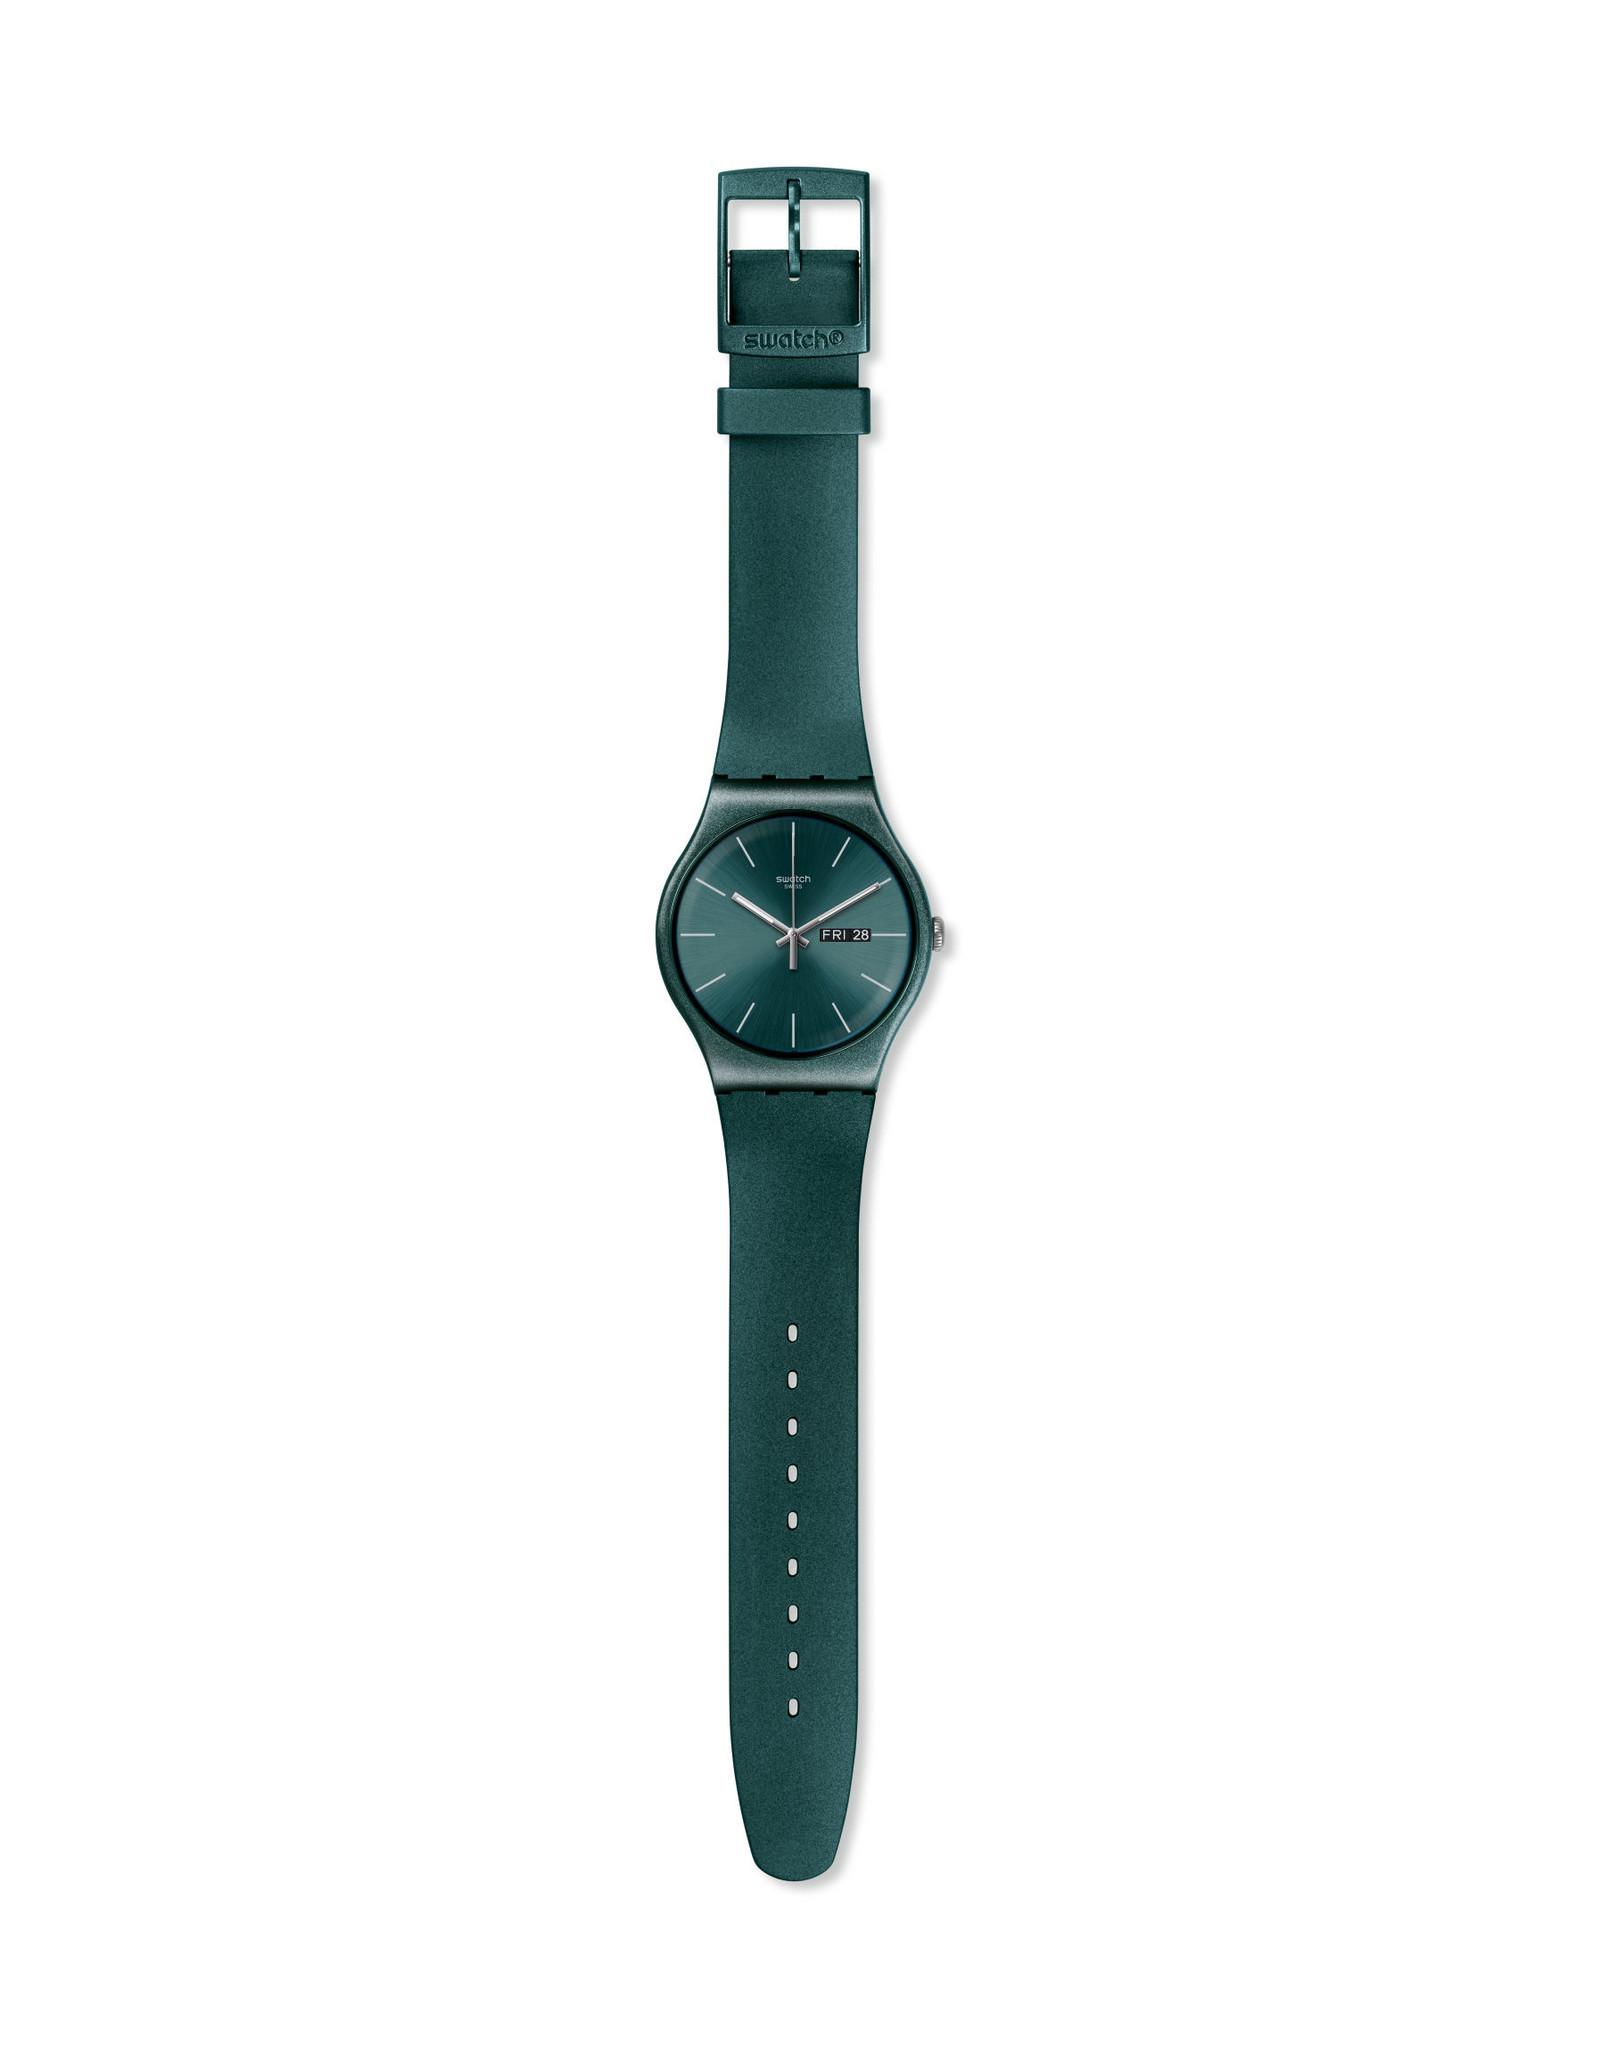 Swatch Swatch SUOG709 ASHBAYANG